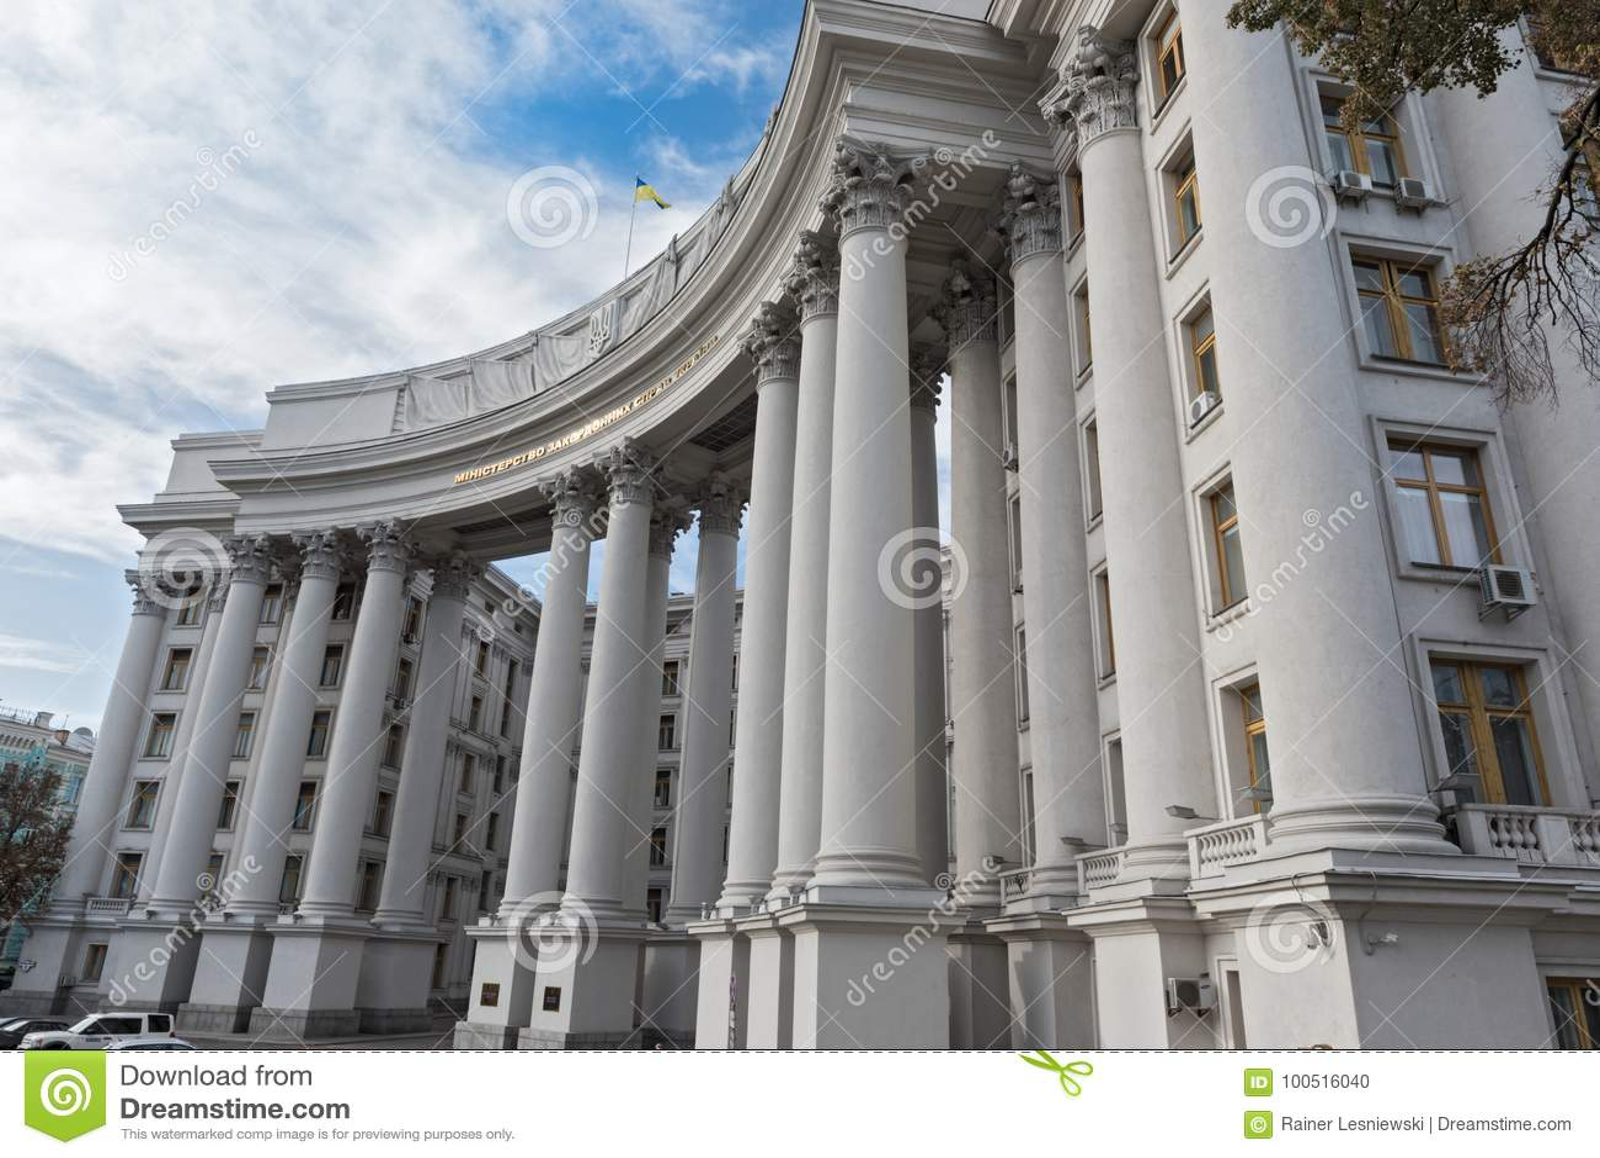 Edificio del Ministerio de Asuntos Exteriores de Ucrania en Kiev